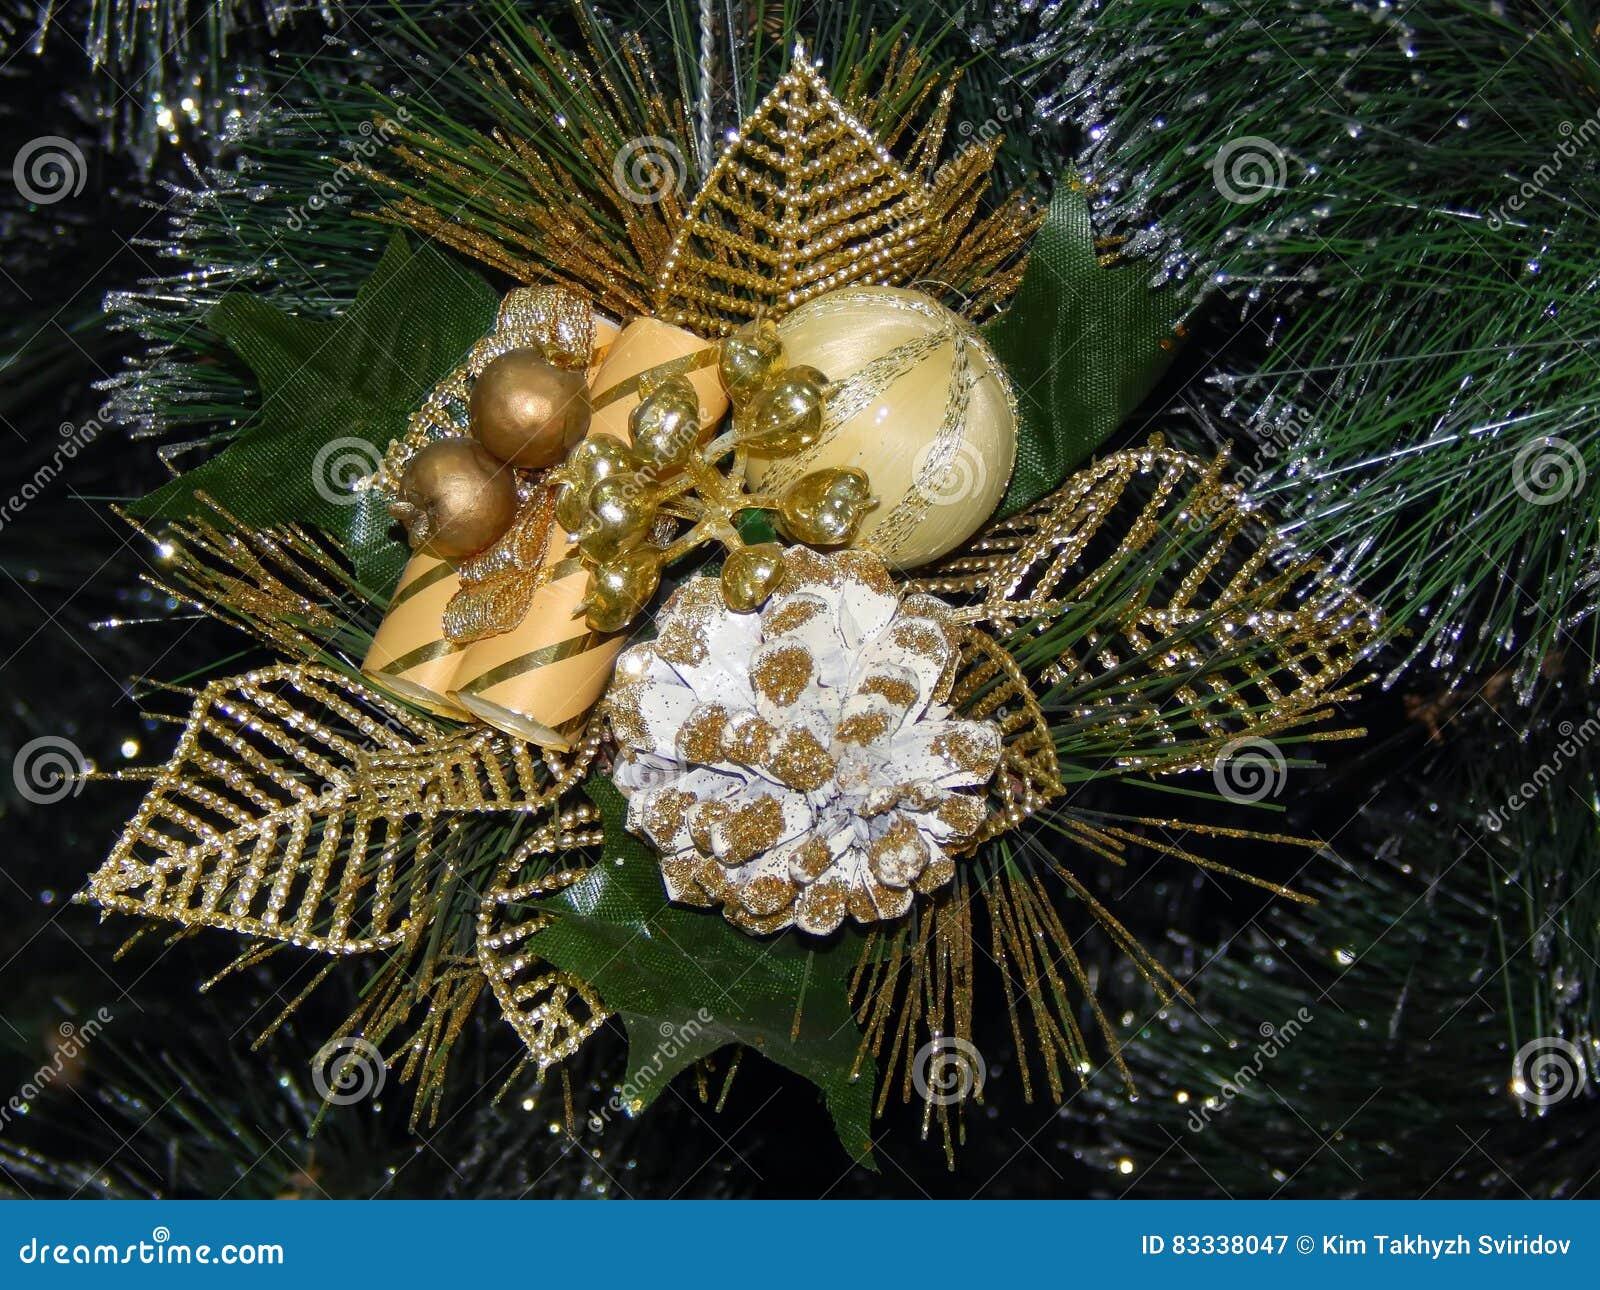 Jewellery Christmas Tree Toy Stock Image - Image of celebration ...